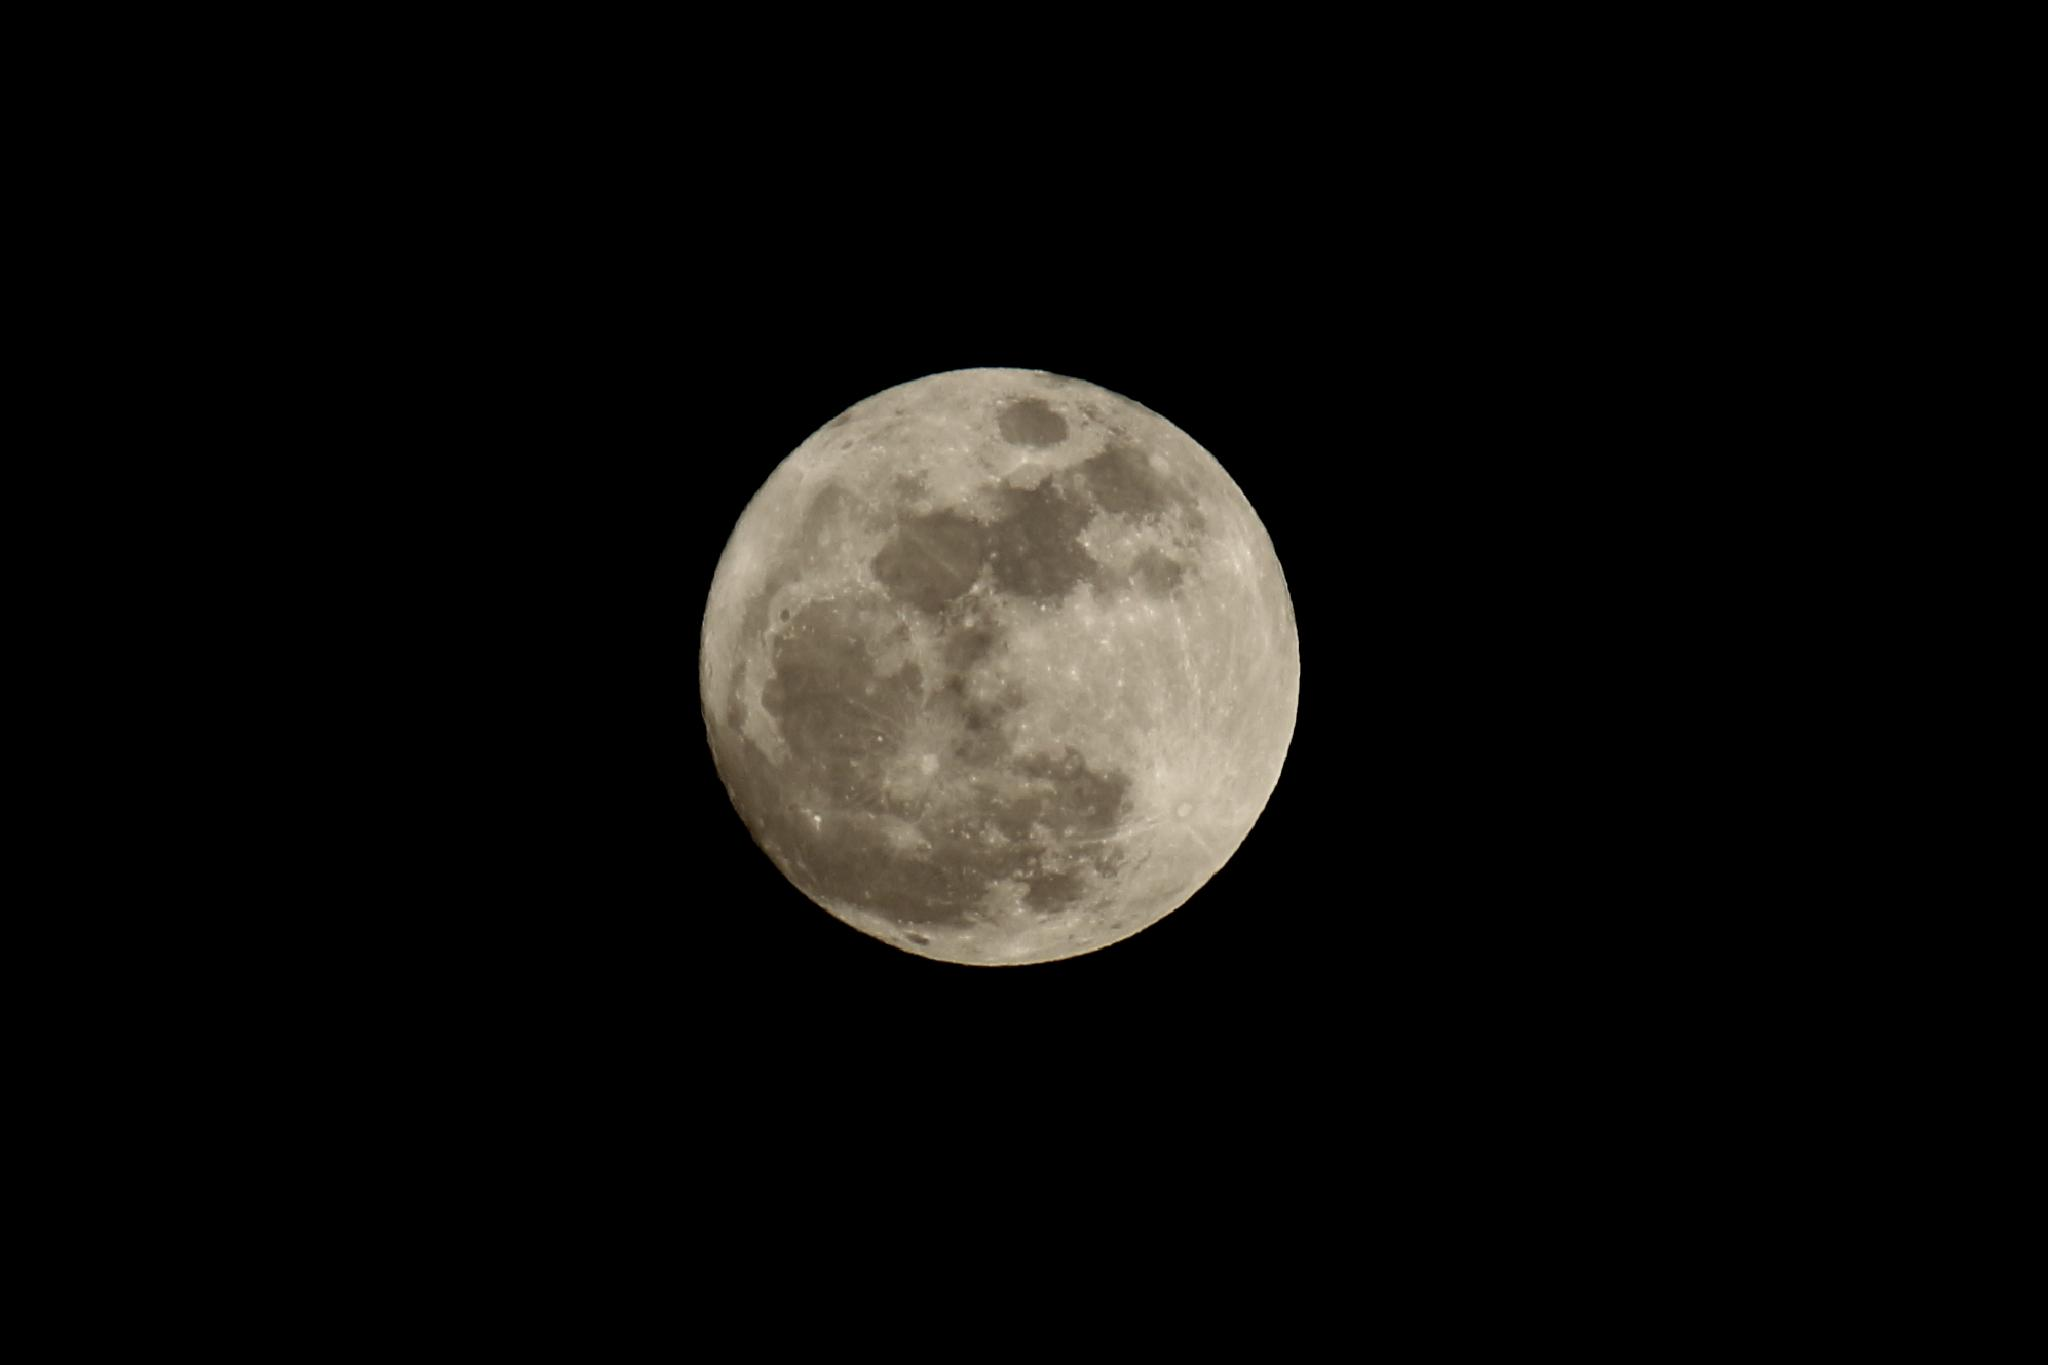 Moon by mikizh.zhekov